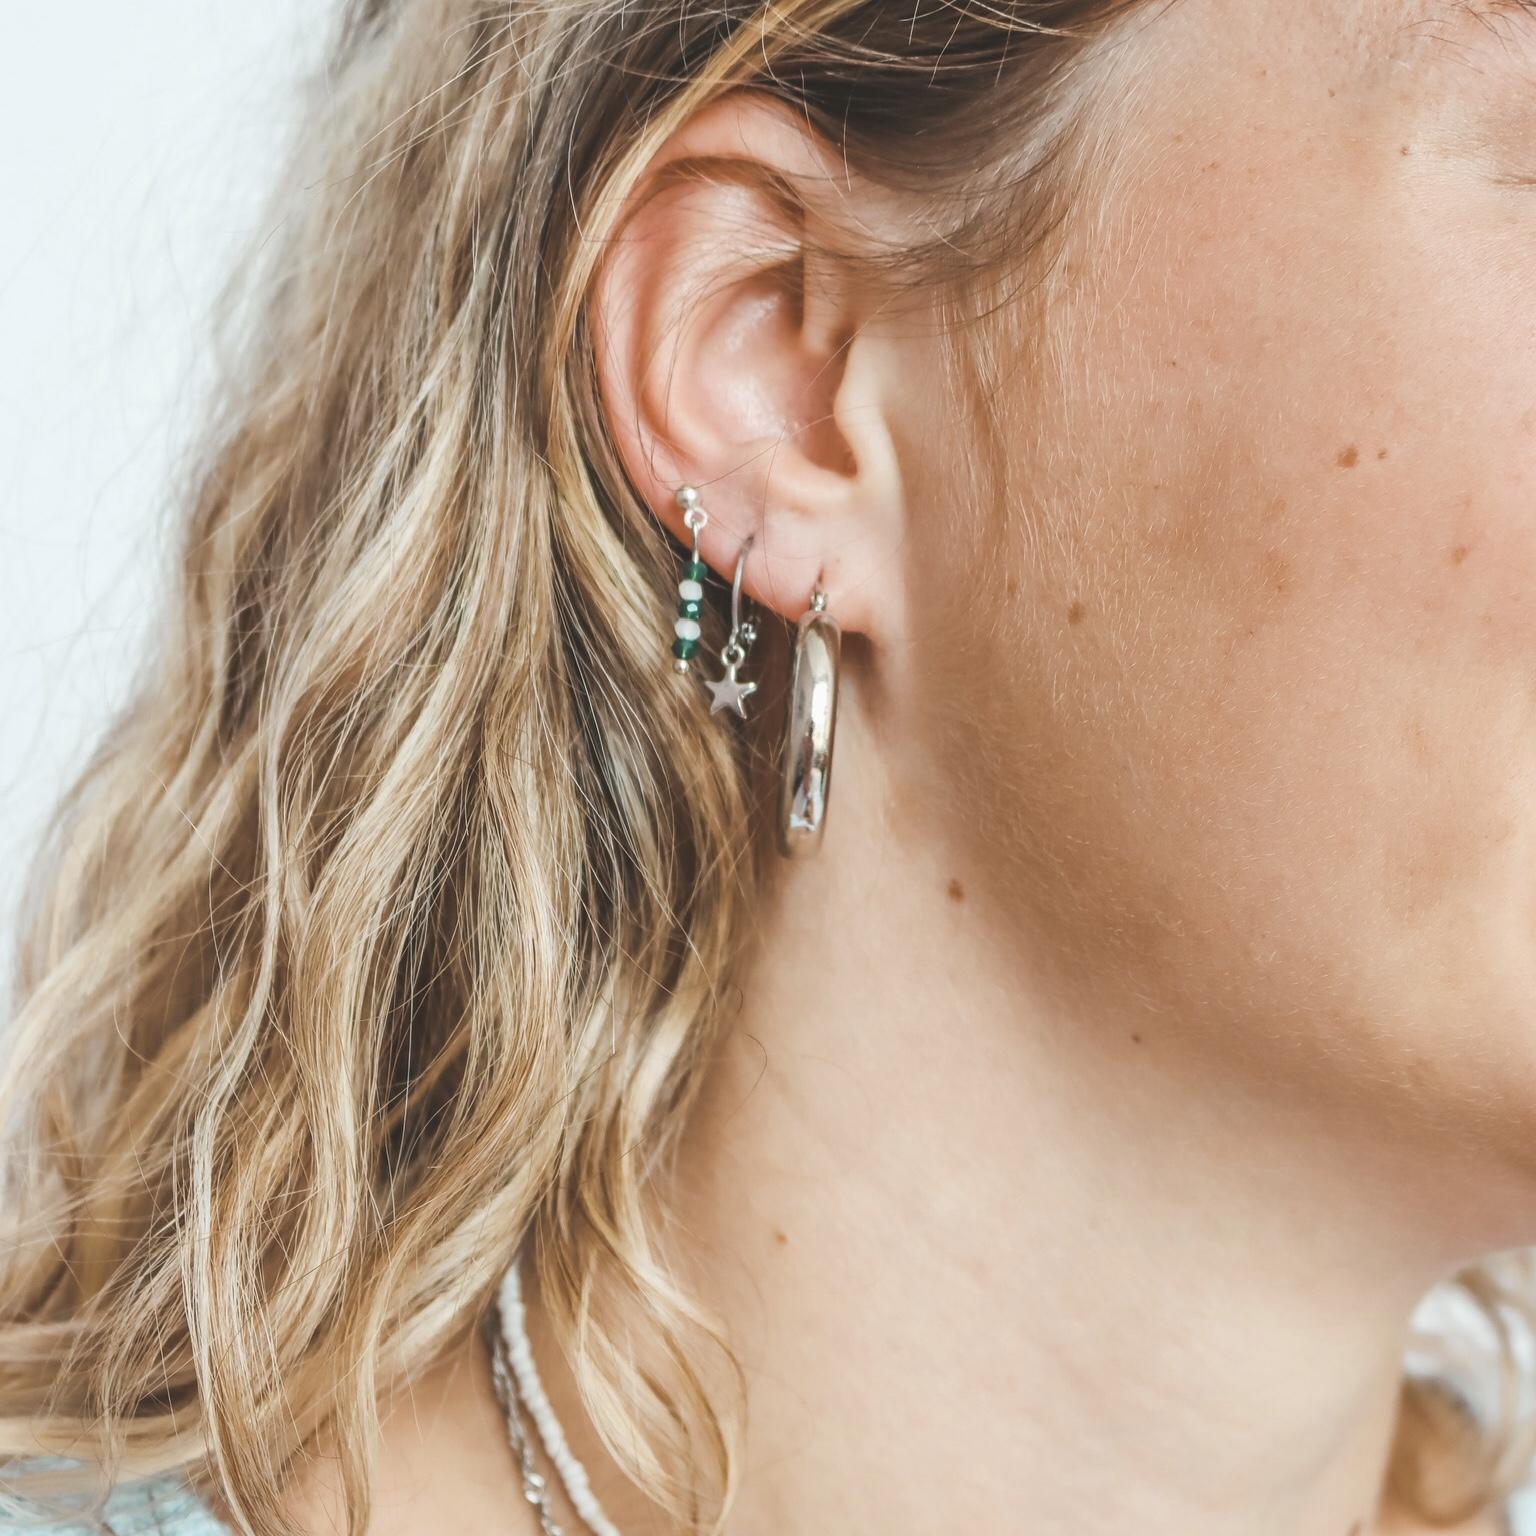 Earring pin silver green white